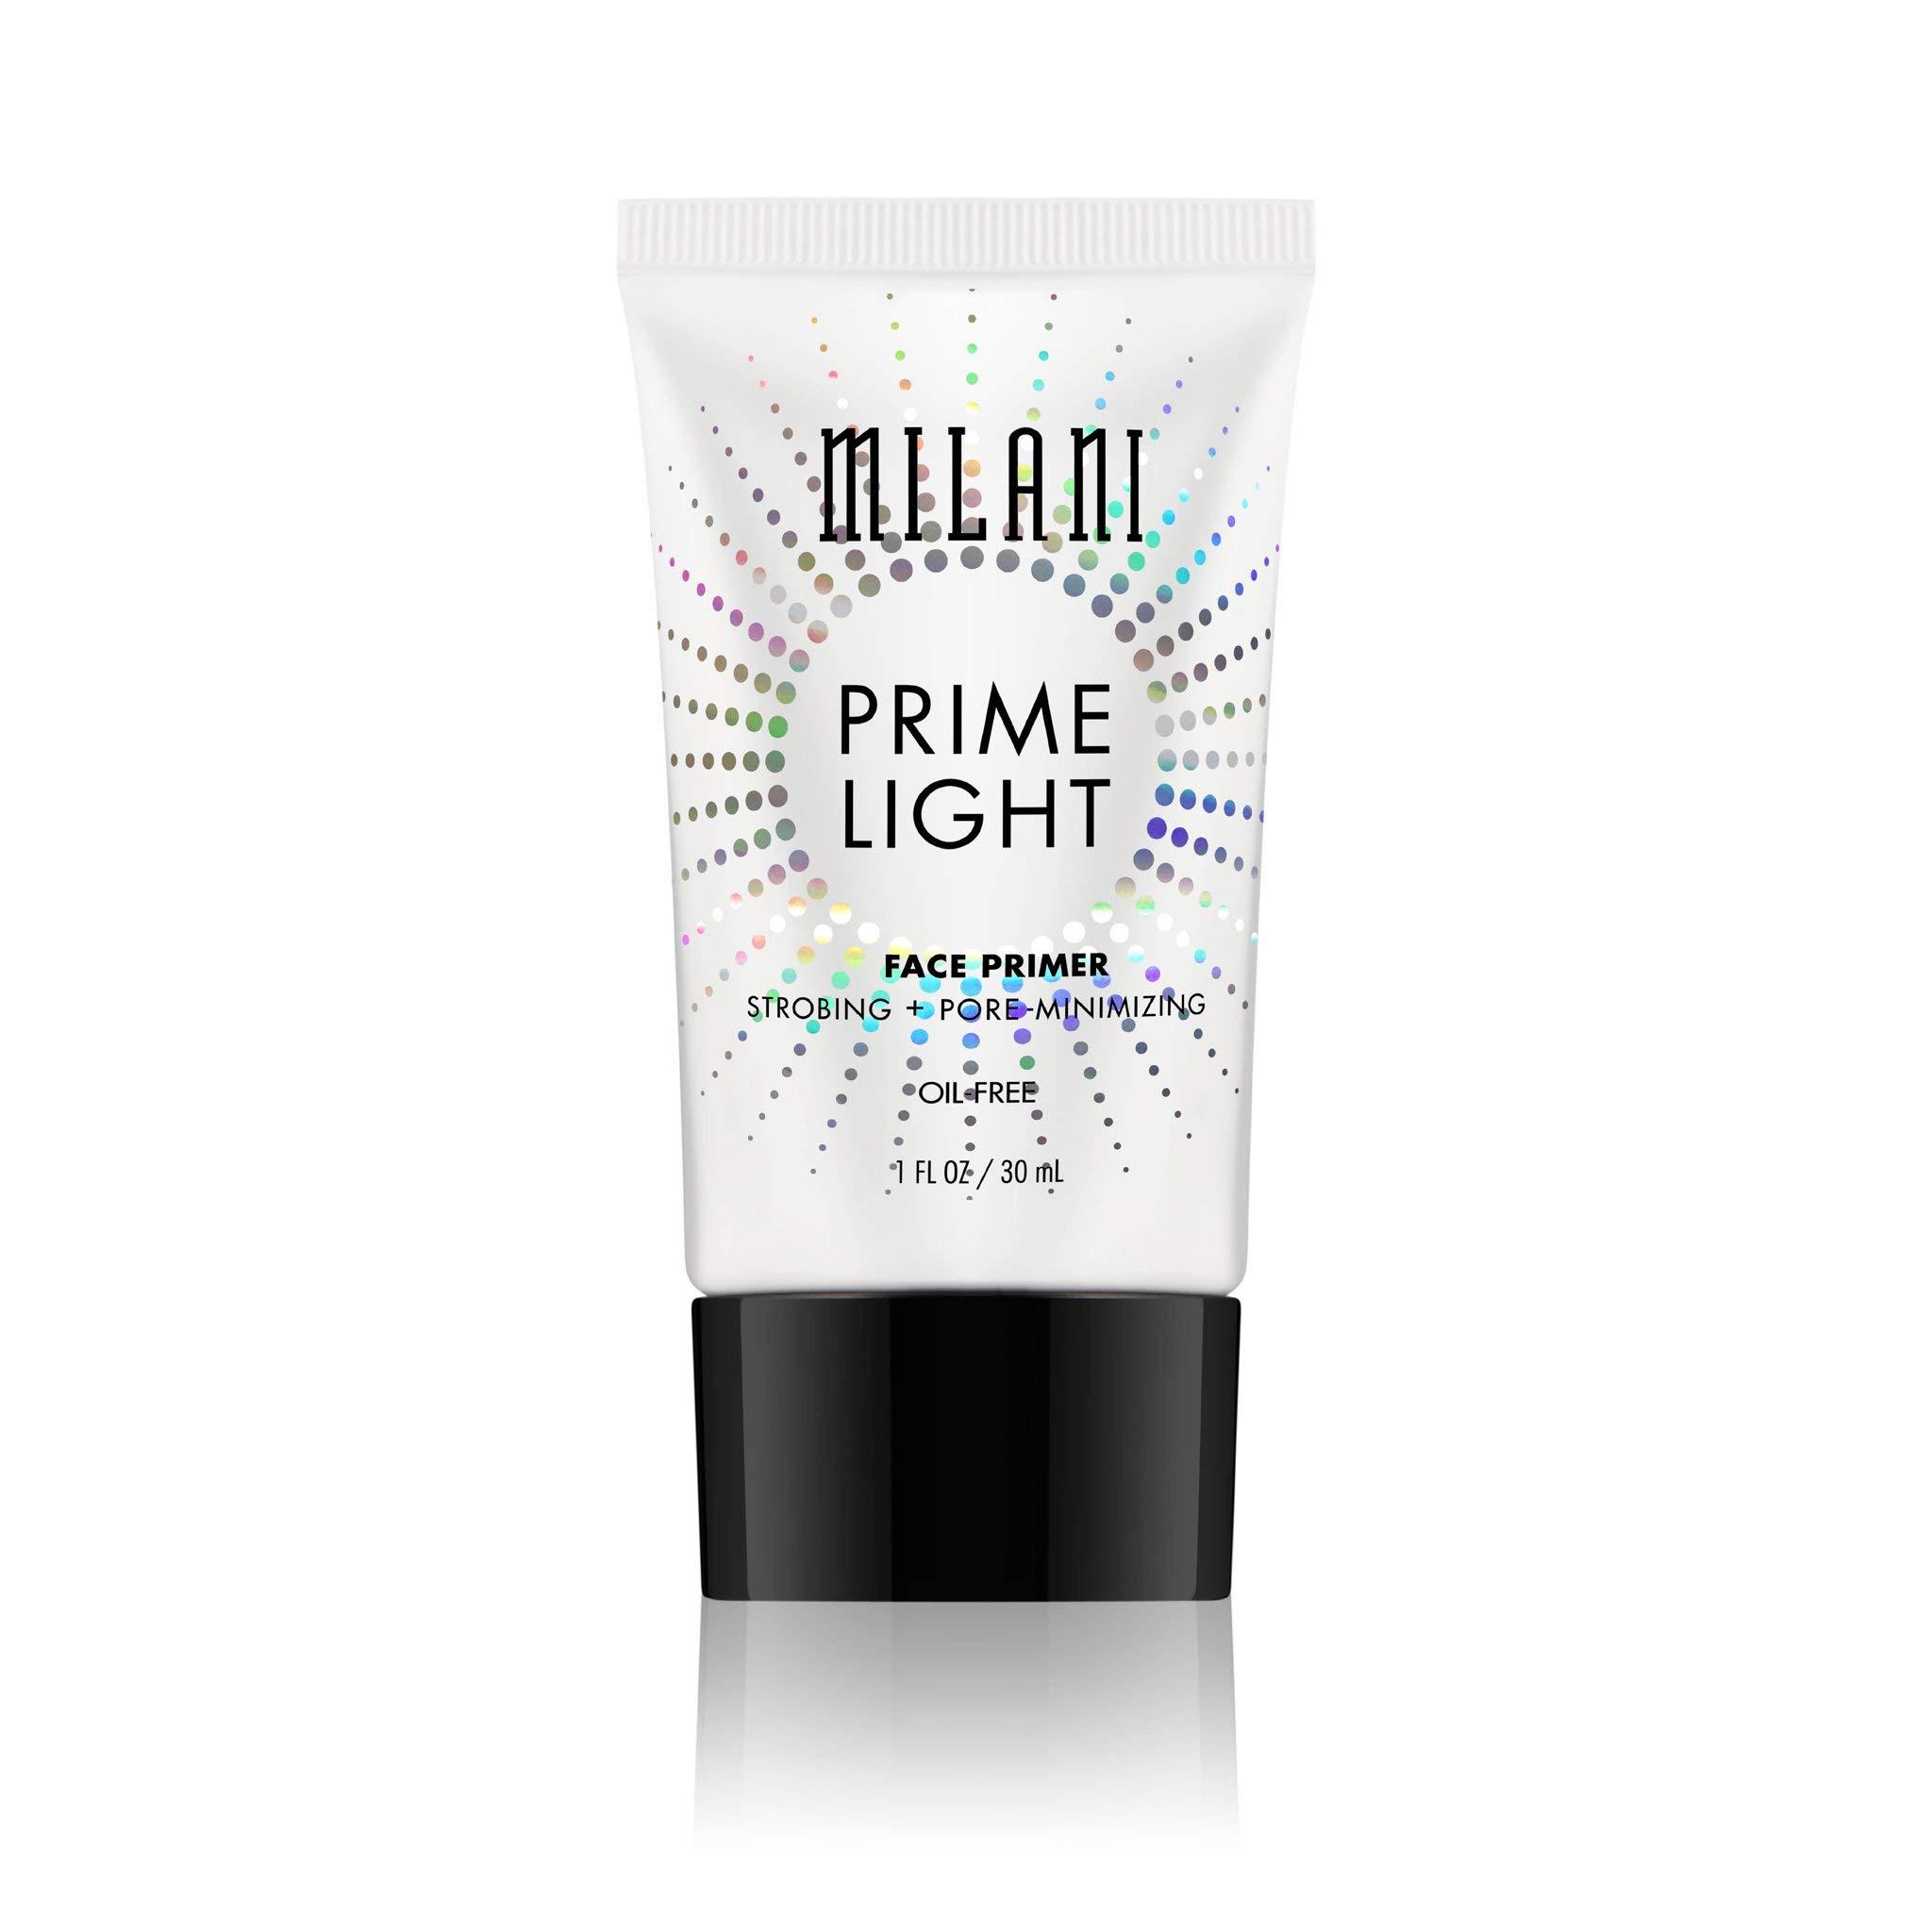 Milani Prime Light Strobing + Pore Minimizing Face Primer - Vegan, Cruelty-Free Face Makeup Primer to Color Correct Skin & Reduce Appearance of Pores